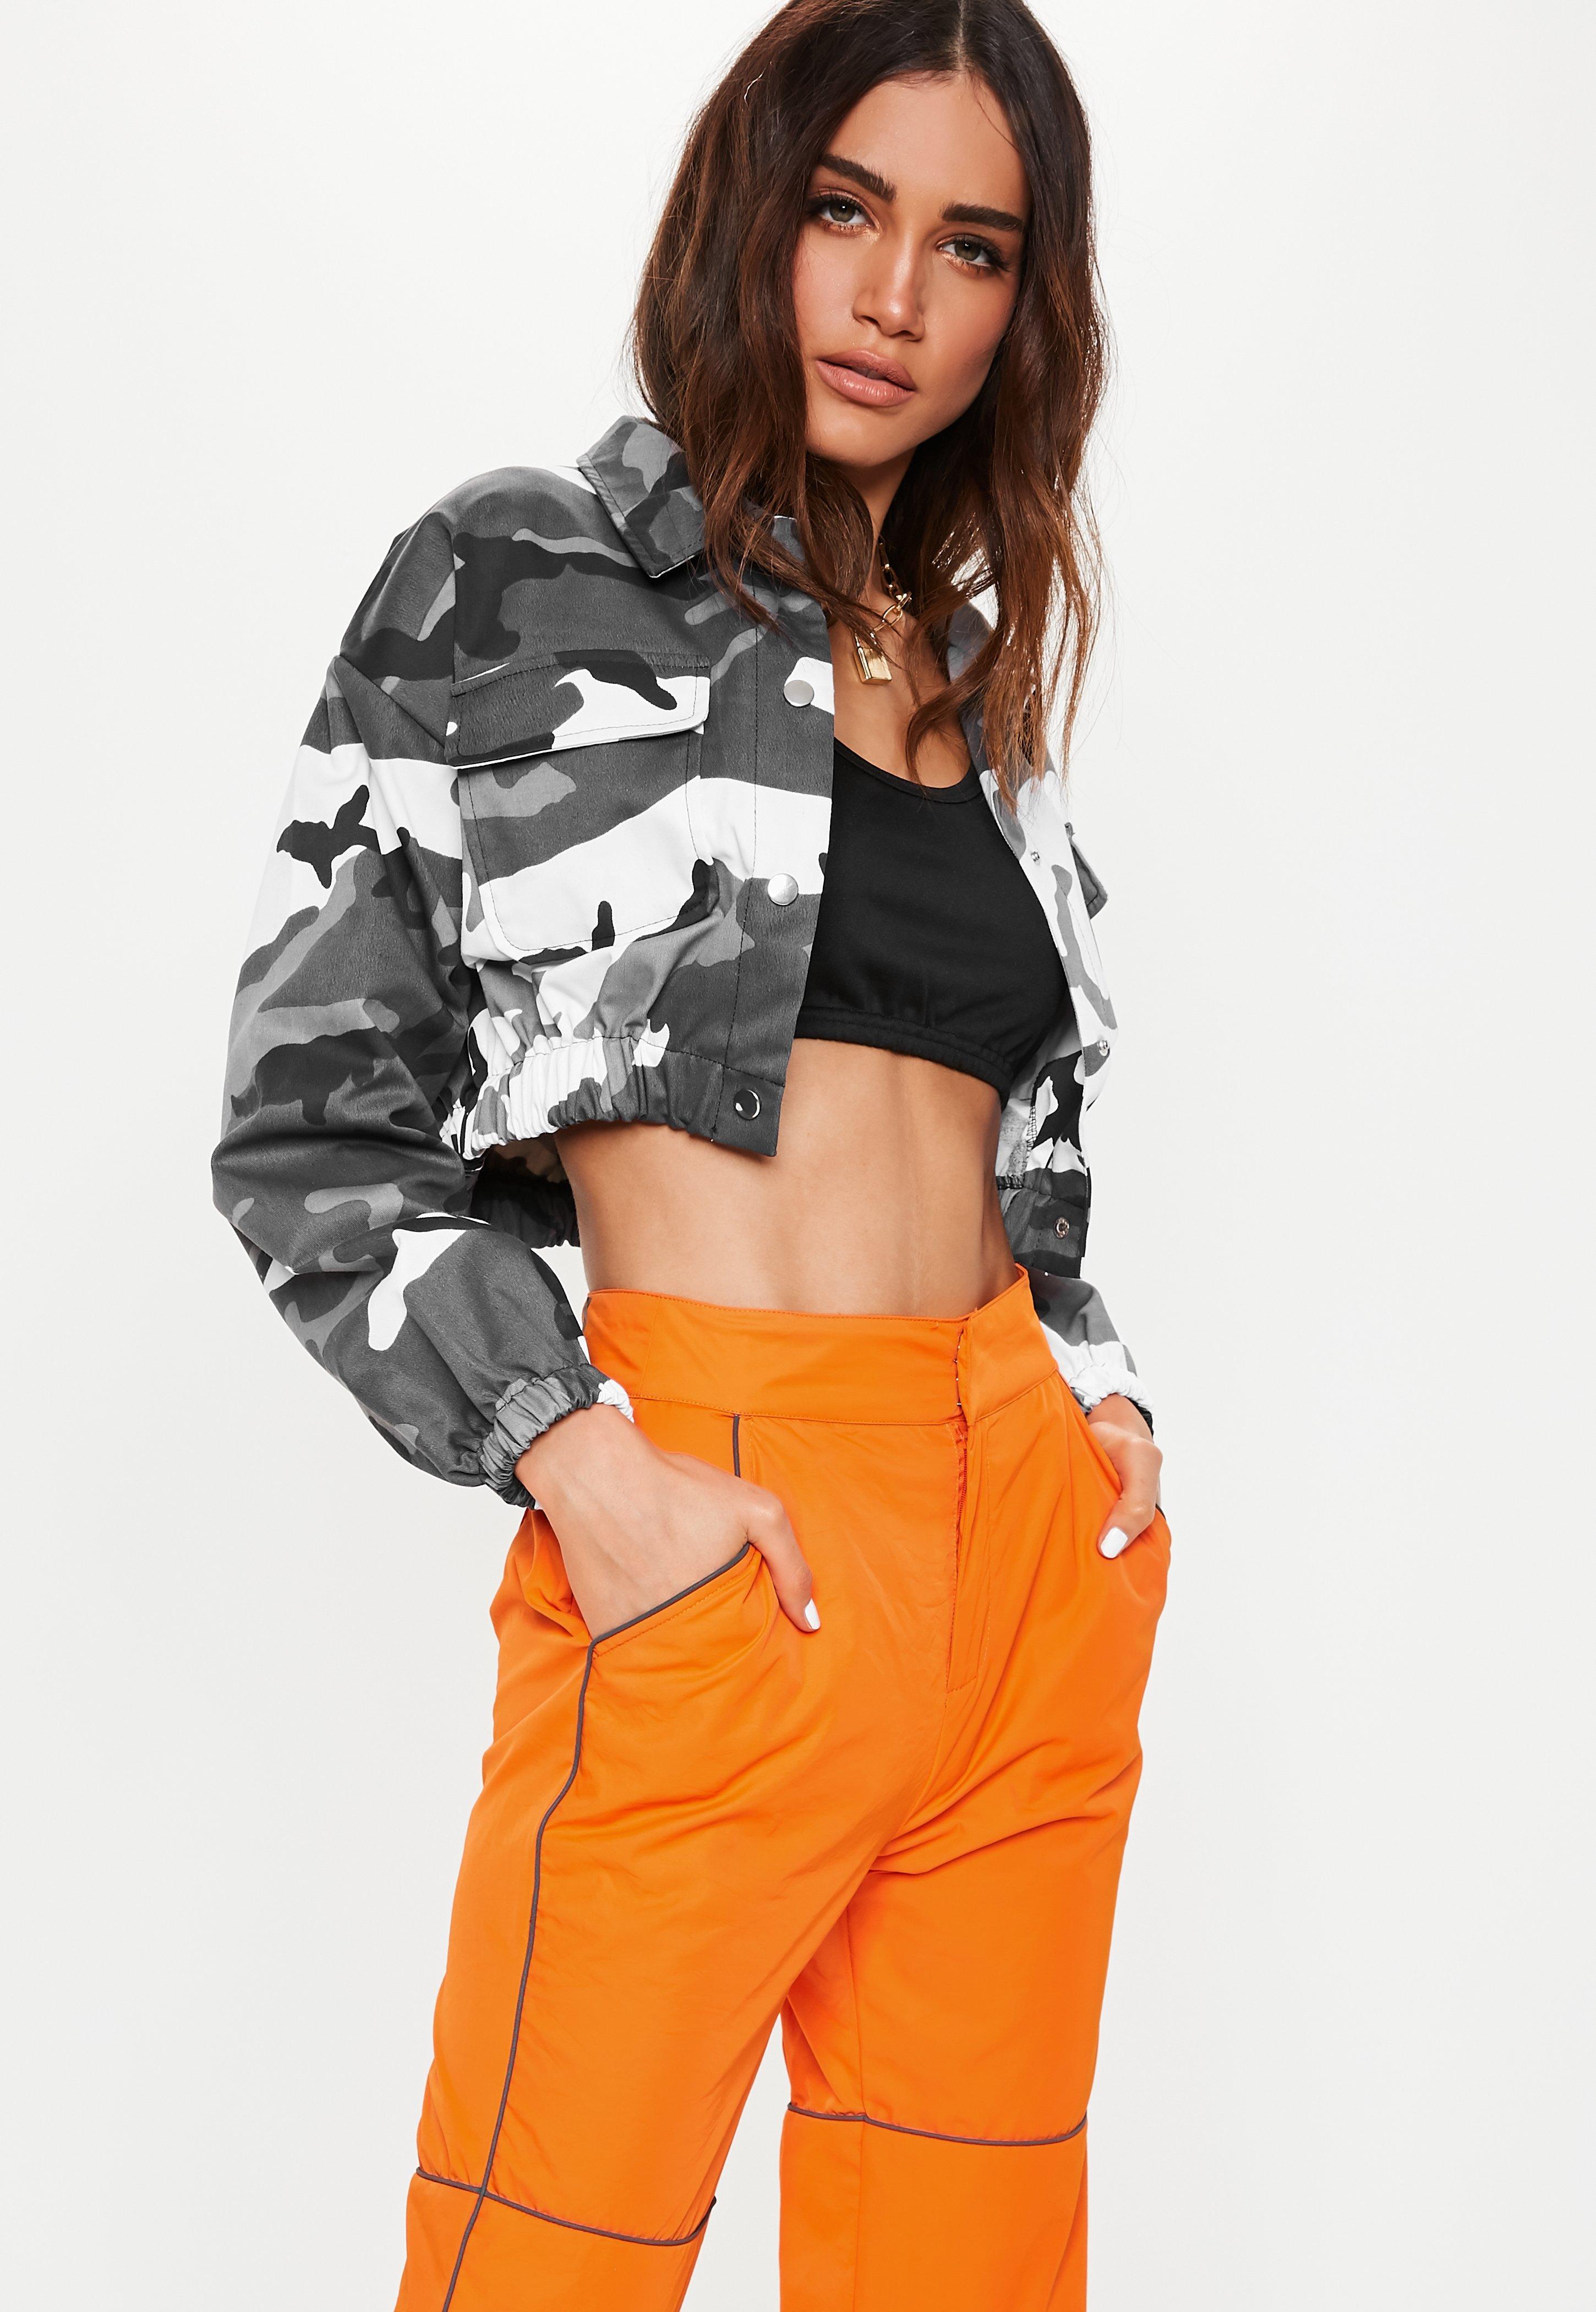 50b954e9f2 90s Fashion   Clothes - Shop 90s Grunge - Missguided